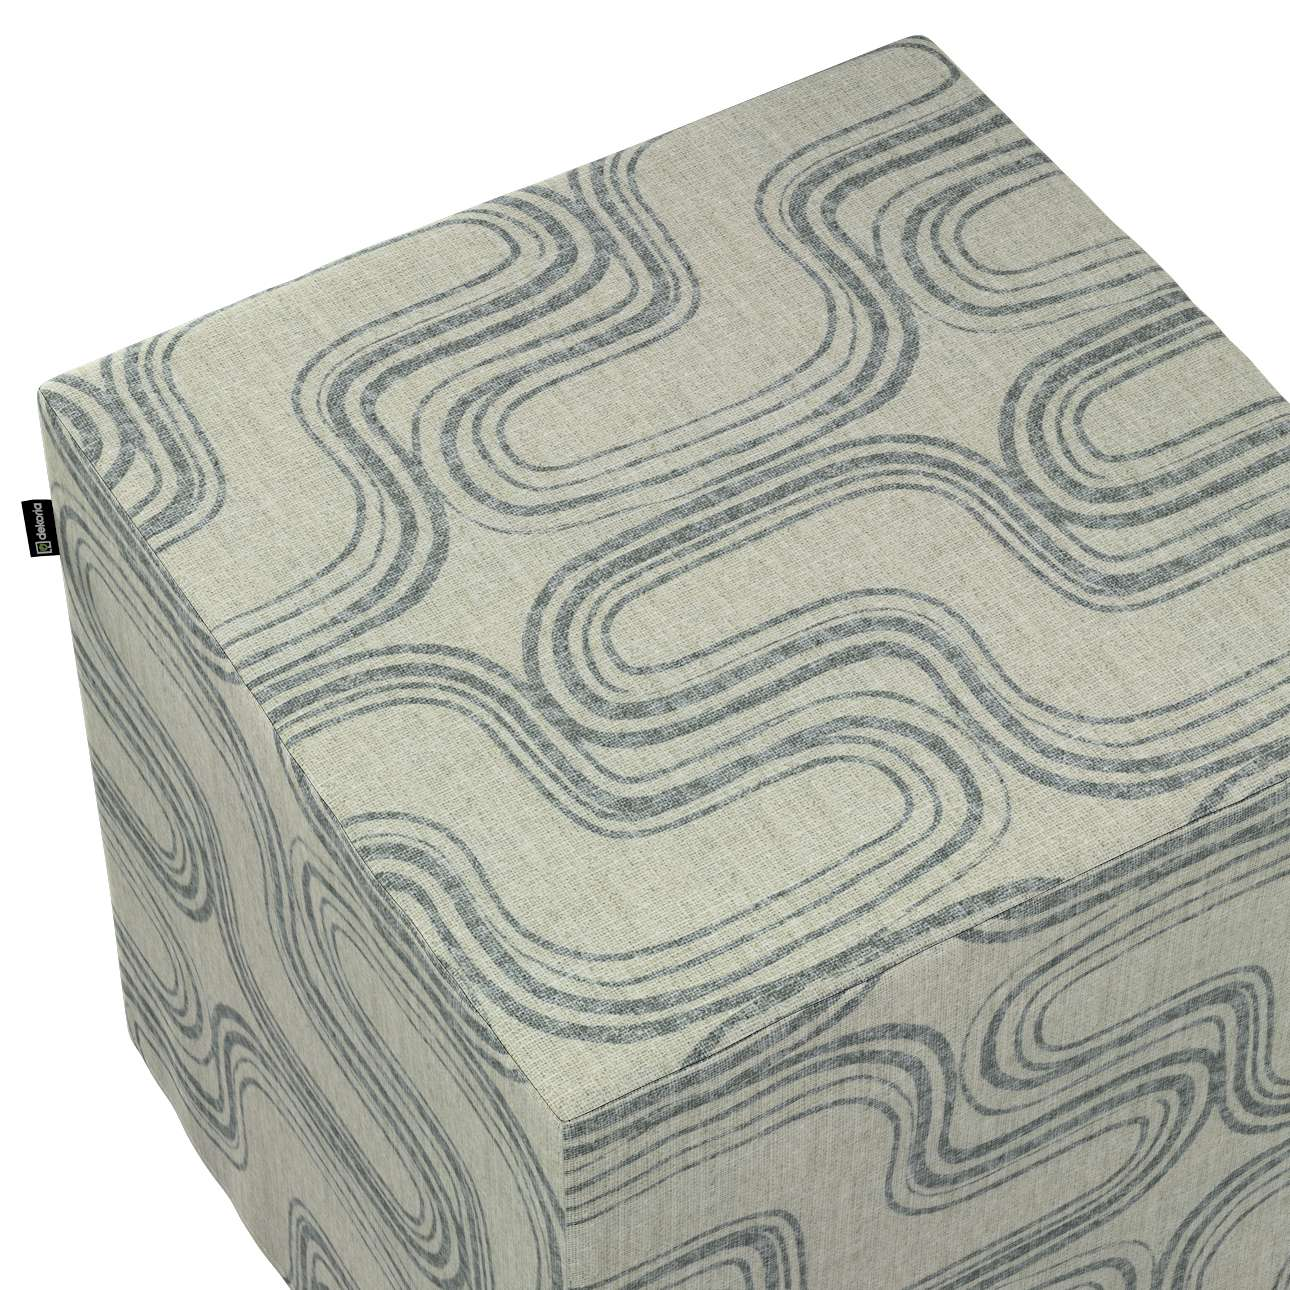 Taburetka tvrdá, kocka V kolekcii Comics, tkanina: 143-14